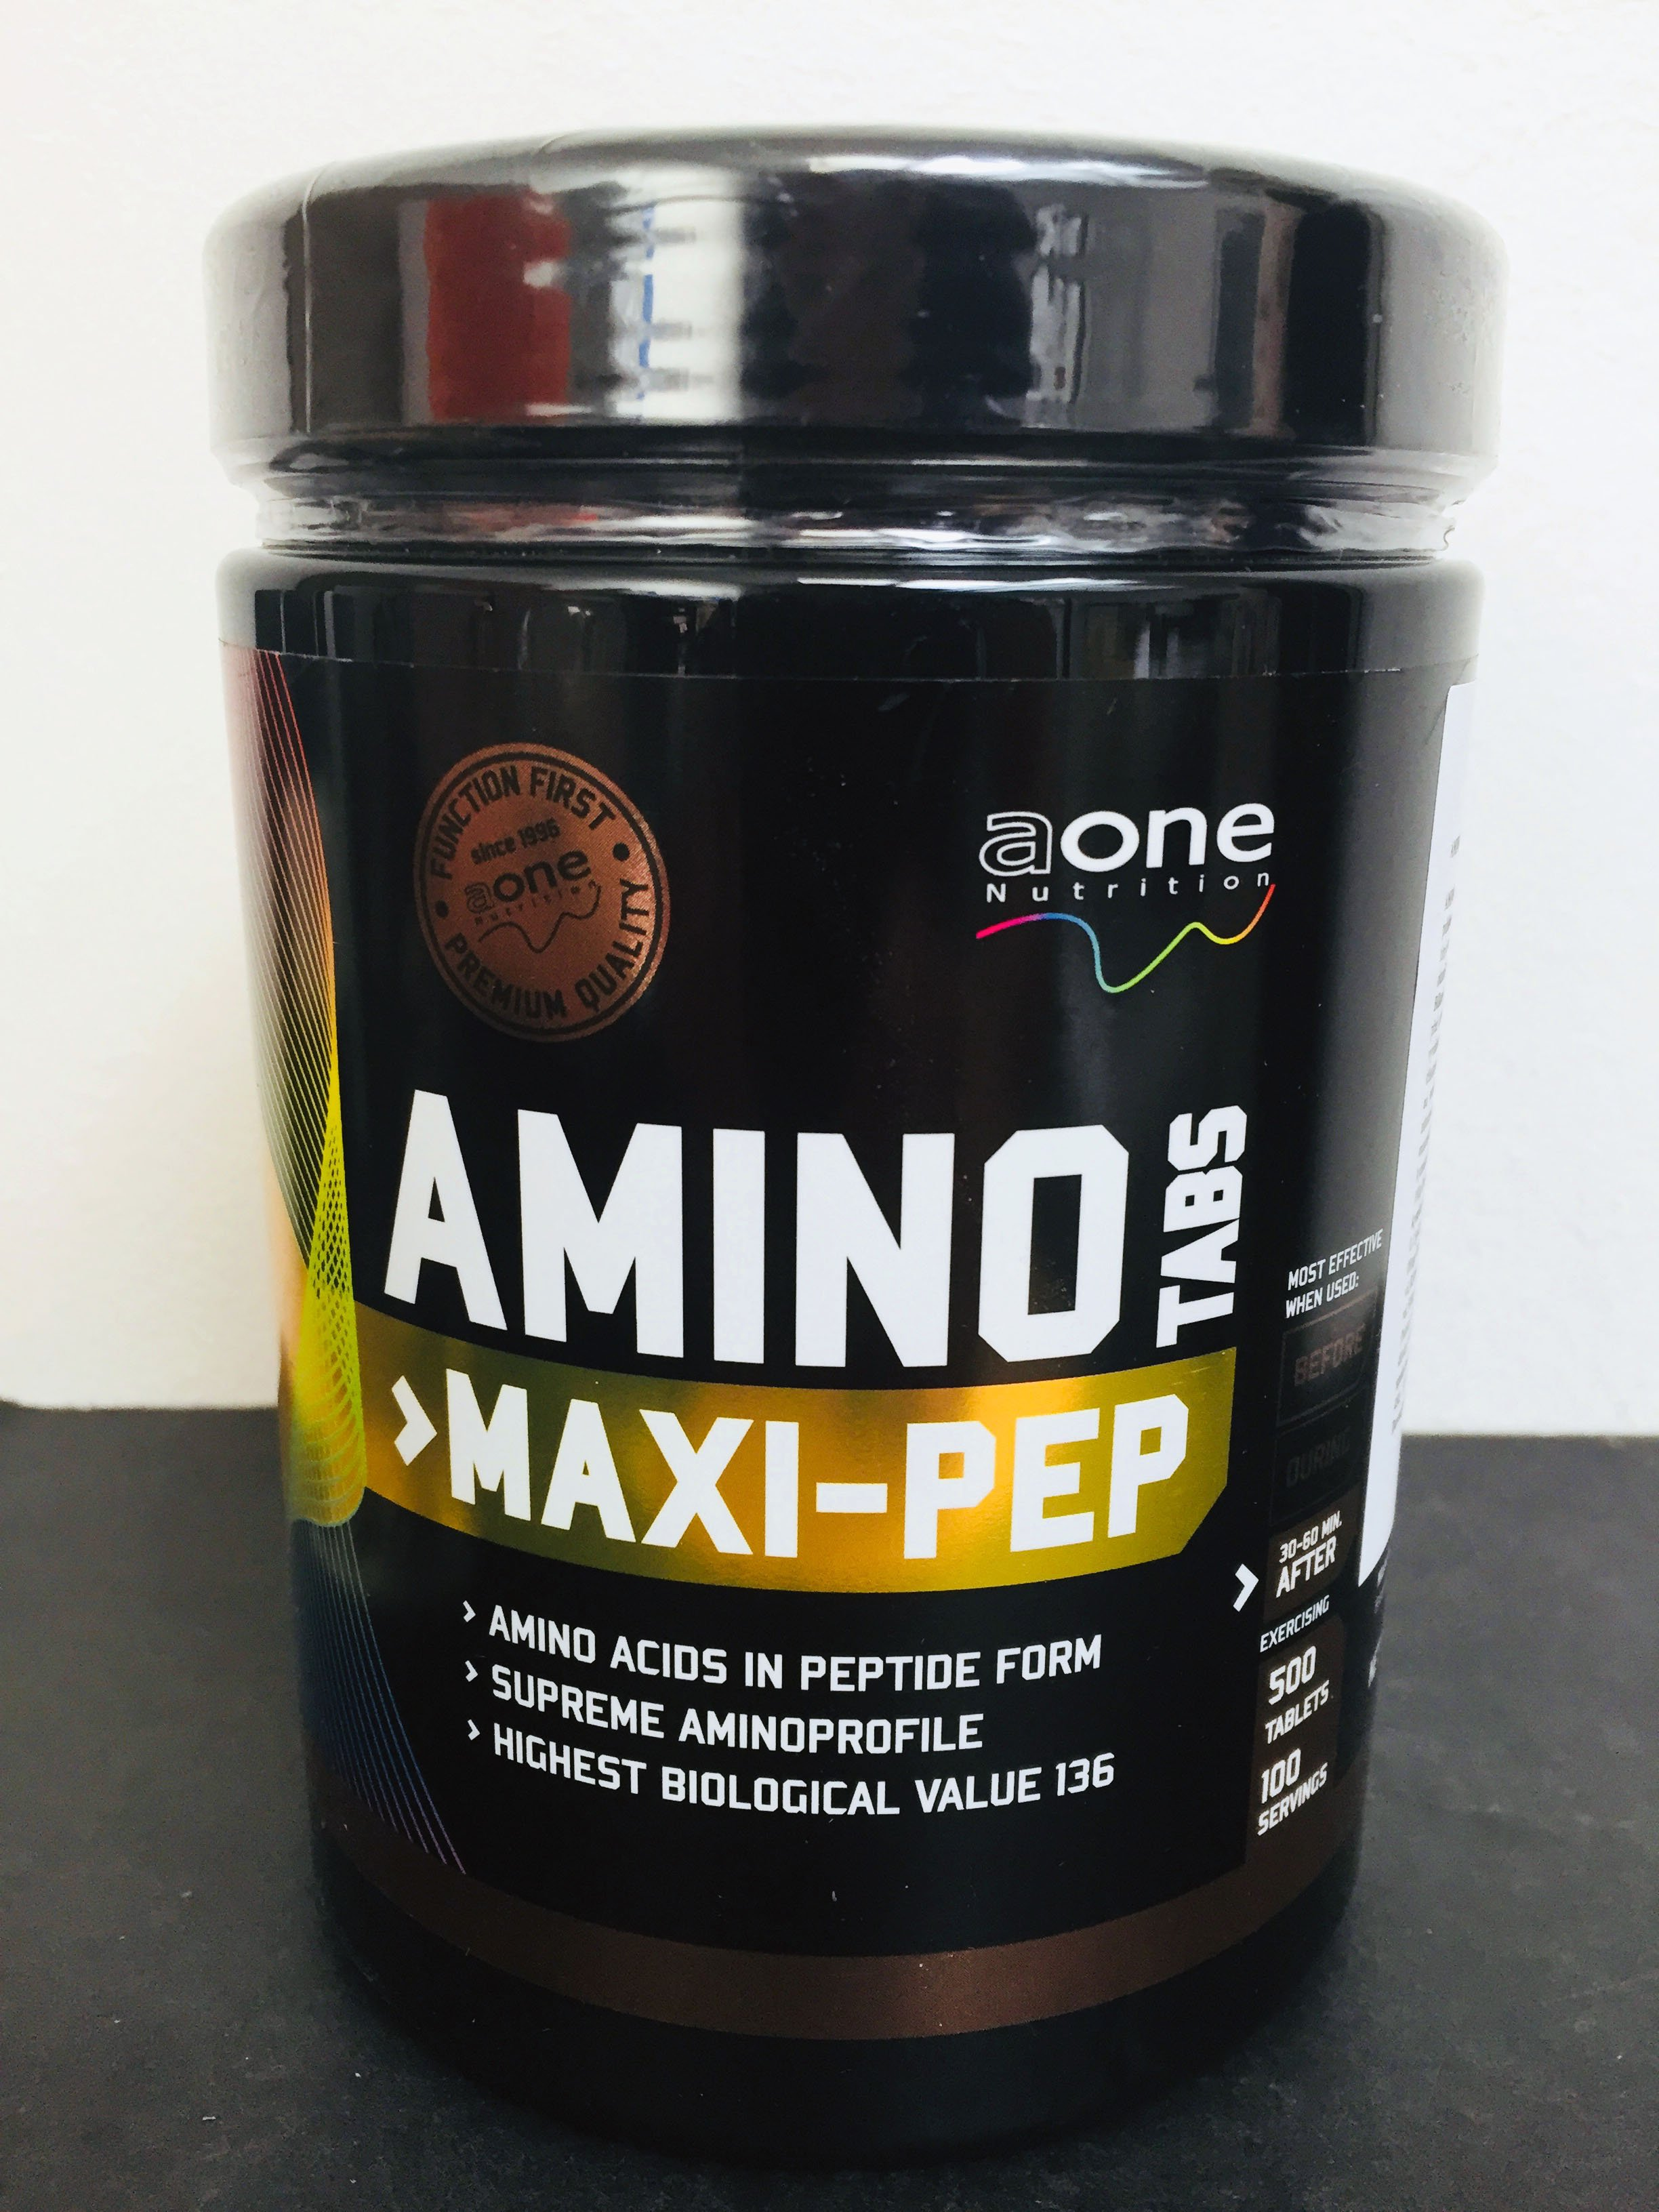 AONE Amino Tabs MAXI-PEP, 500 tablet